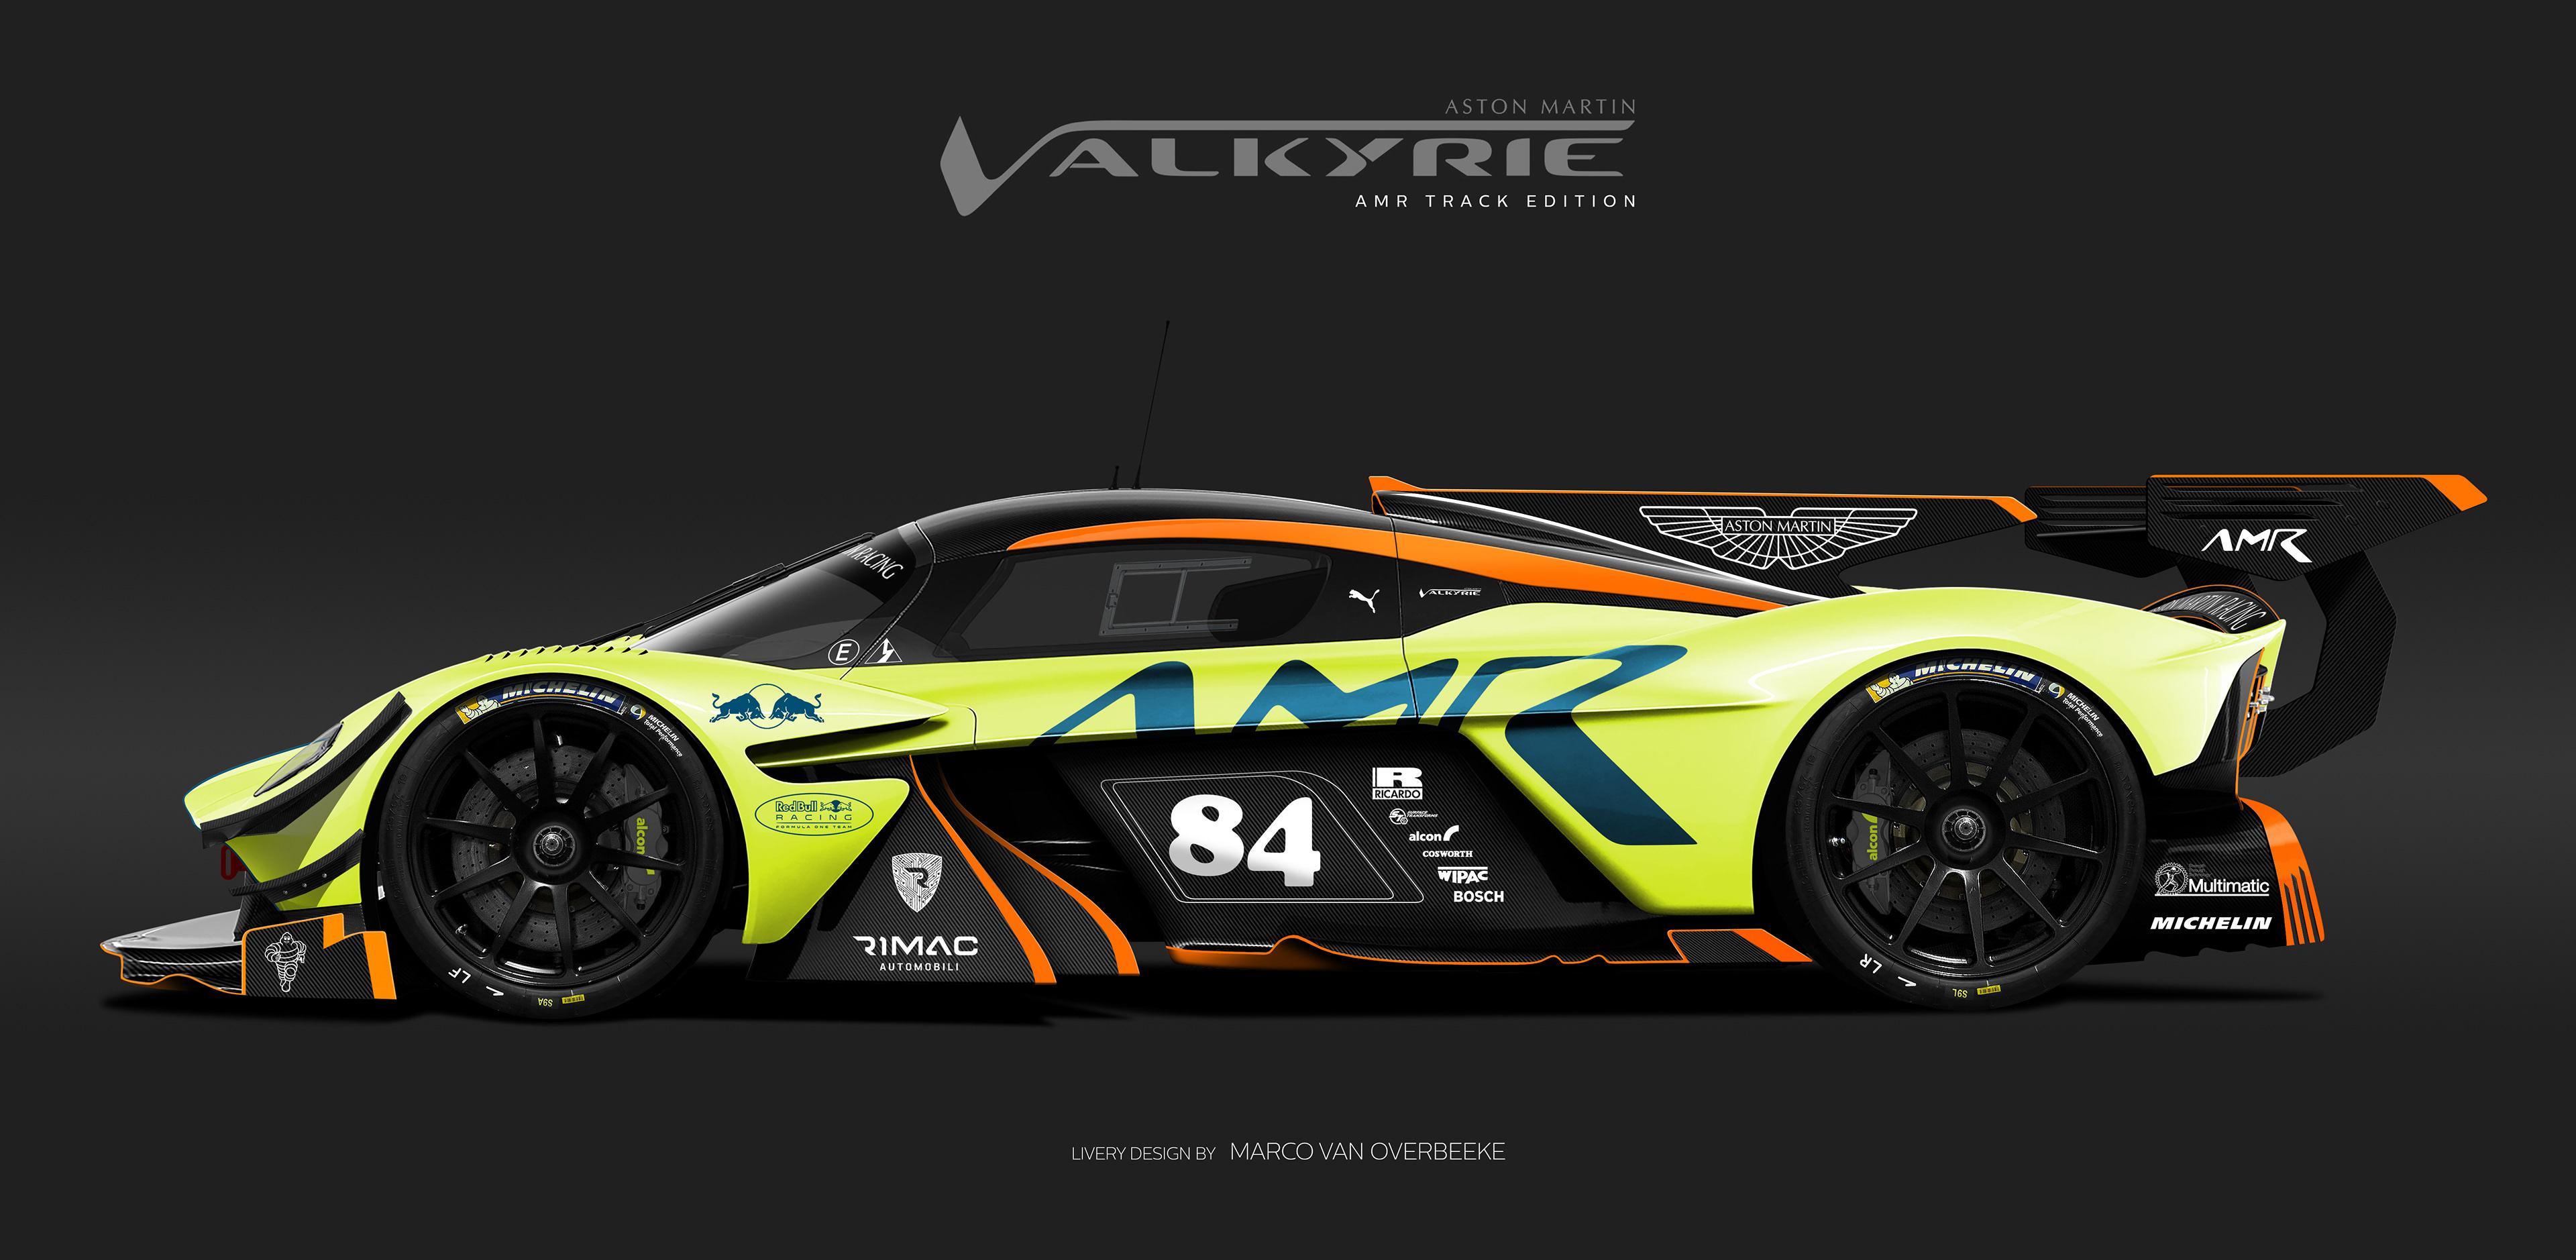 Ferrari Lmp1 2018 >> Marco van Overbeeke | freelance automotive designer - Aston Martin Valkyrie Heritage & AMR Pro ...